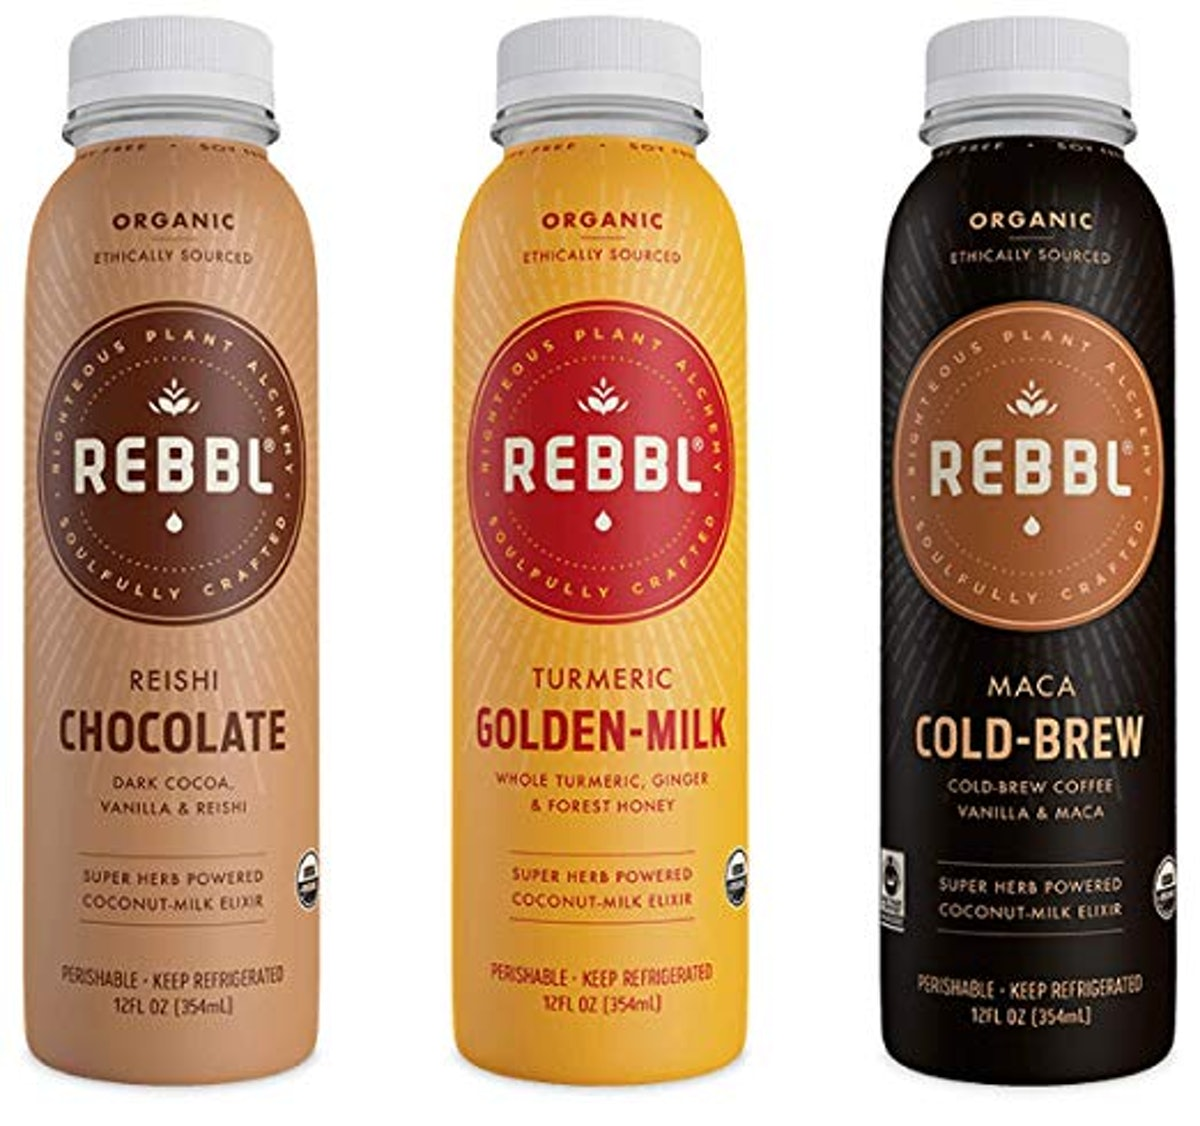 REBBL Variety Pack (6-Pack)